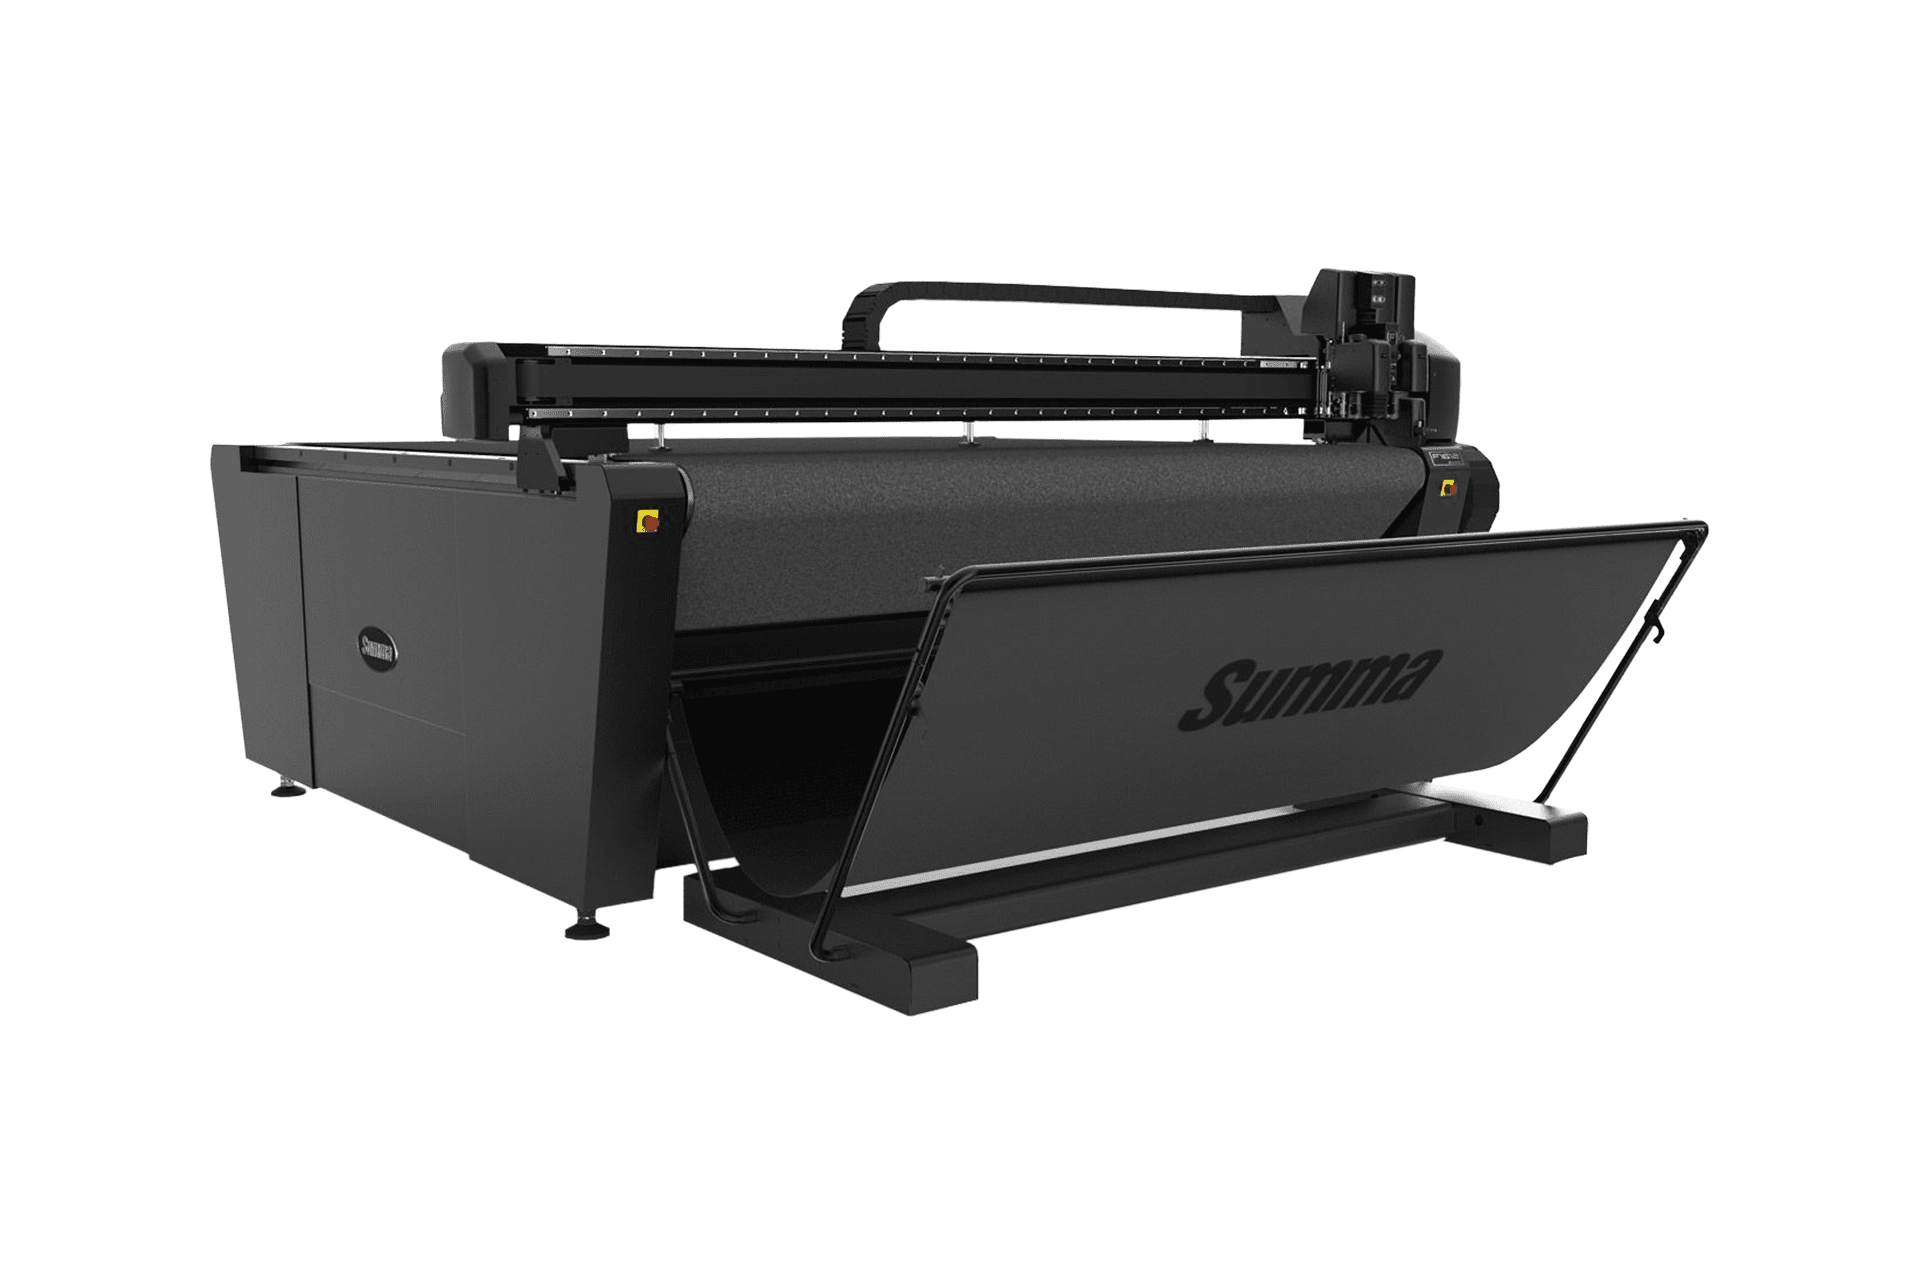 maskinene-summa-f1612